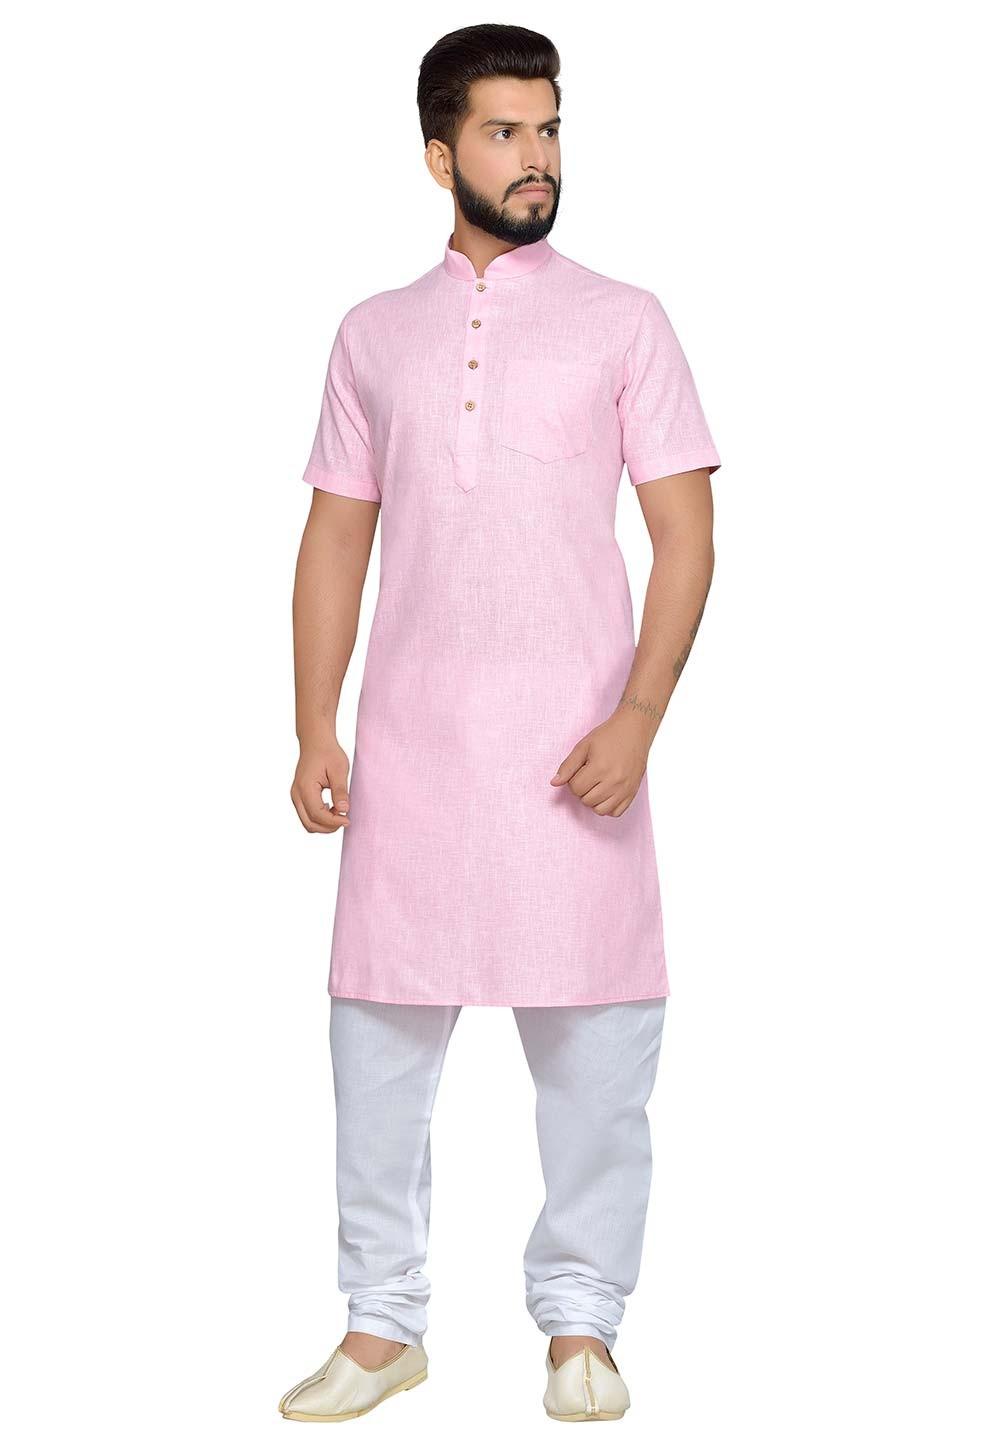 Pink Color Cotton Fabric Readymade Kurta Pyjama.